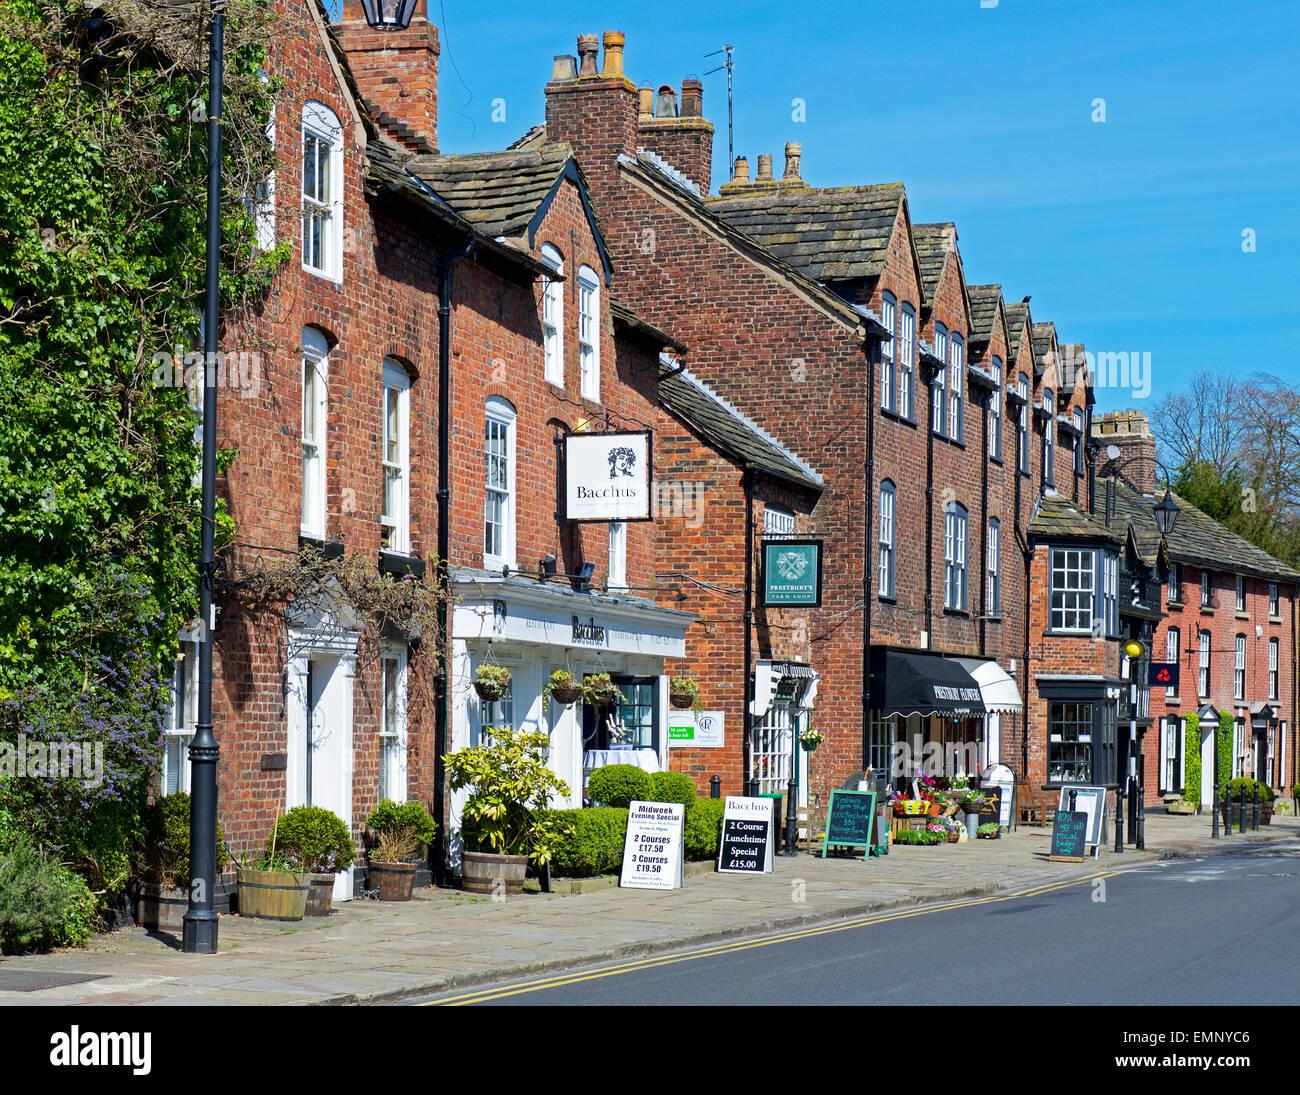 Street in the village of Prestbury, Cheshire, England UK - Stock Image